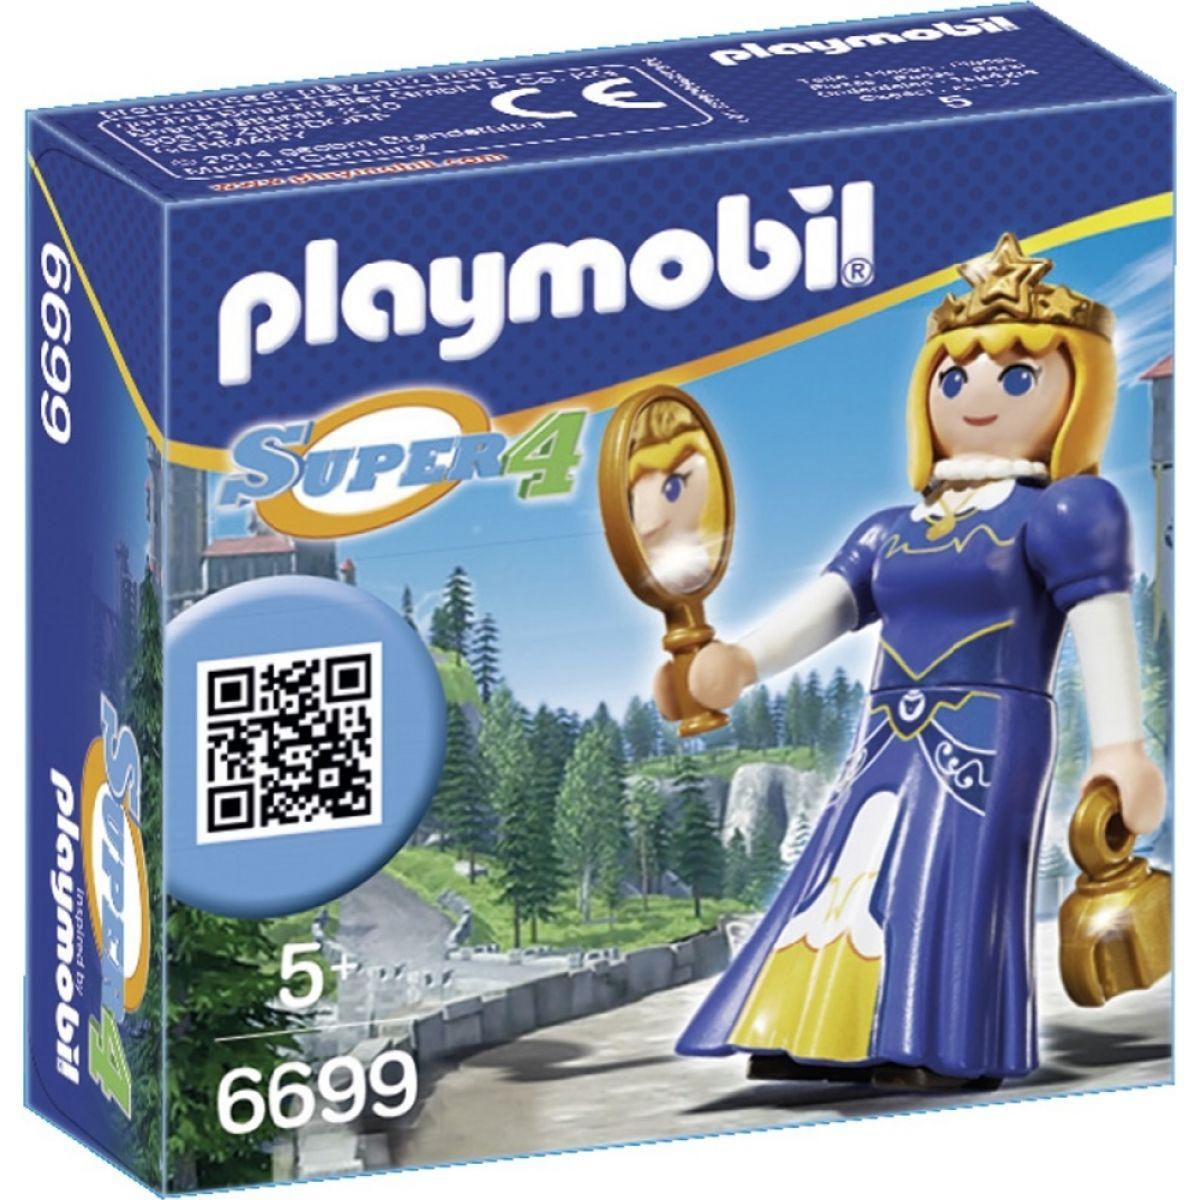 Playmobil 6699 Princezna Leonora